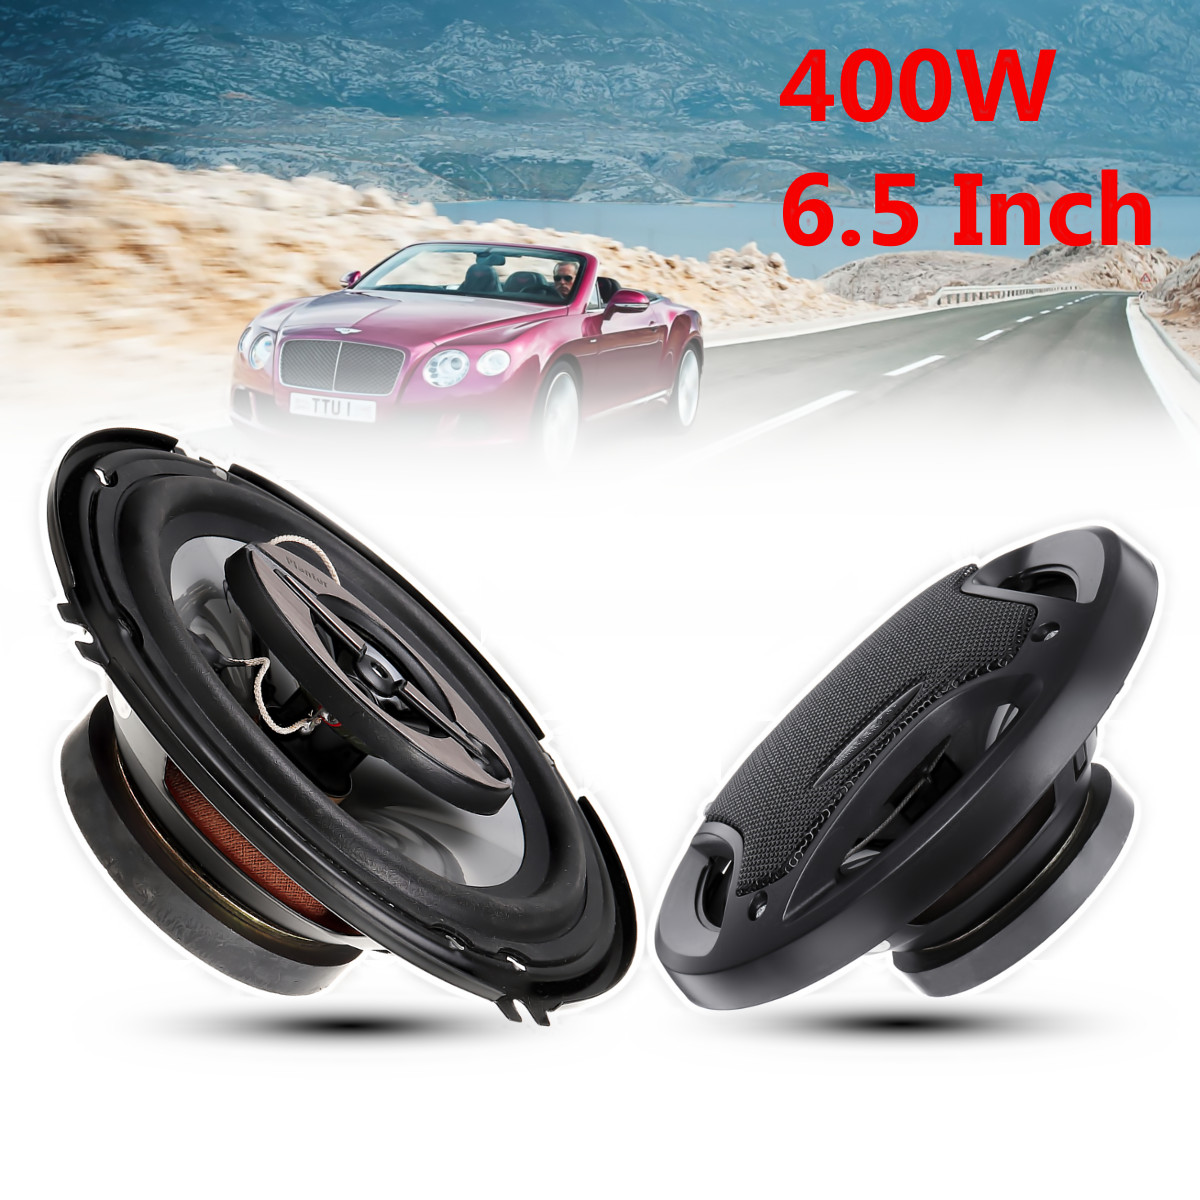 2pcs 6 5 inch 400W 3 Way Auto font b Car b font Loudspeaker Coaxial Speakers